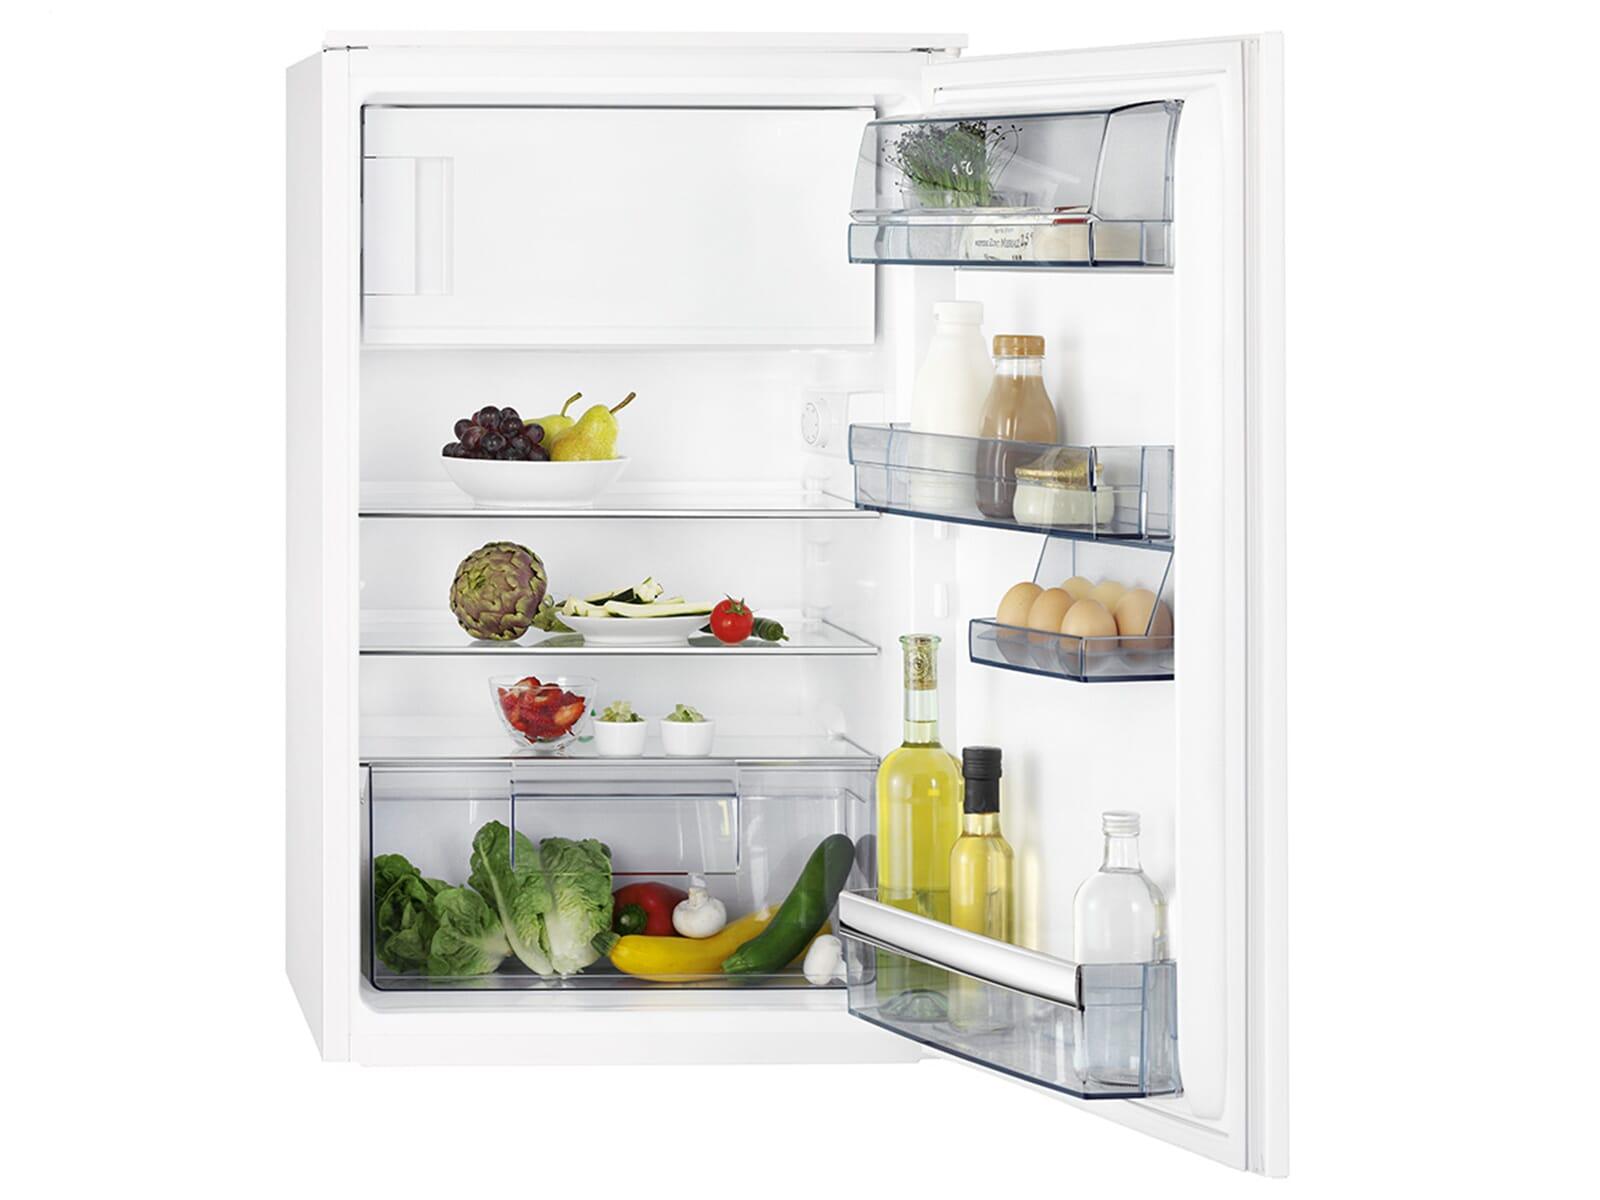 Amica Kühlschrank Einbau : Einbaukühlschrank günstig amica kuehlschrank günstig online